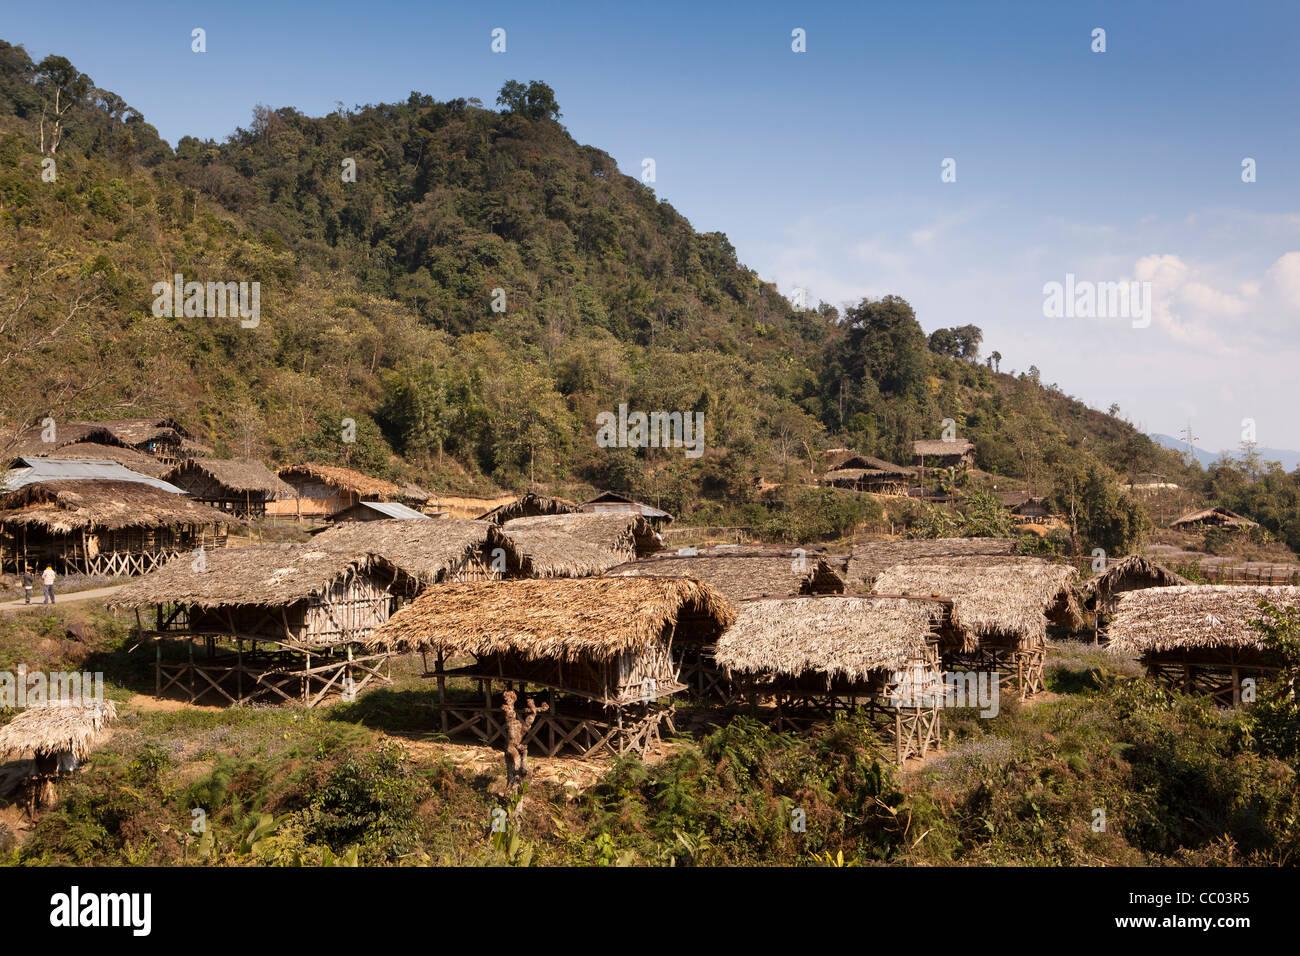 India, Arunachal Pradesh, Daporijo, Upper Subansiri area, hill village constructed from natural materials - Stock Image